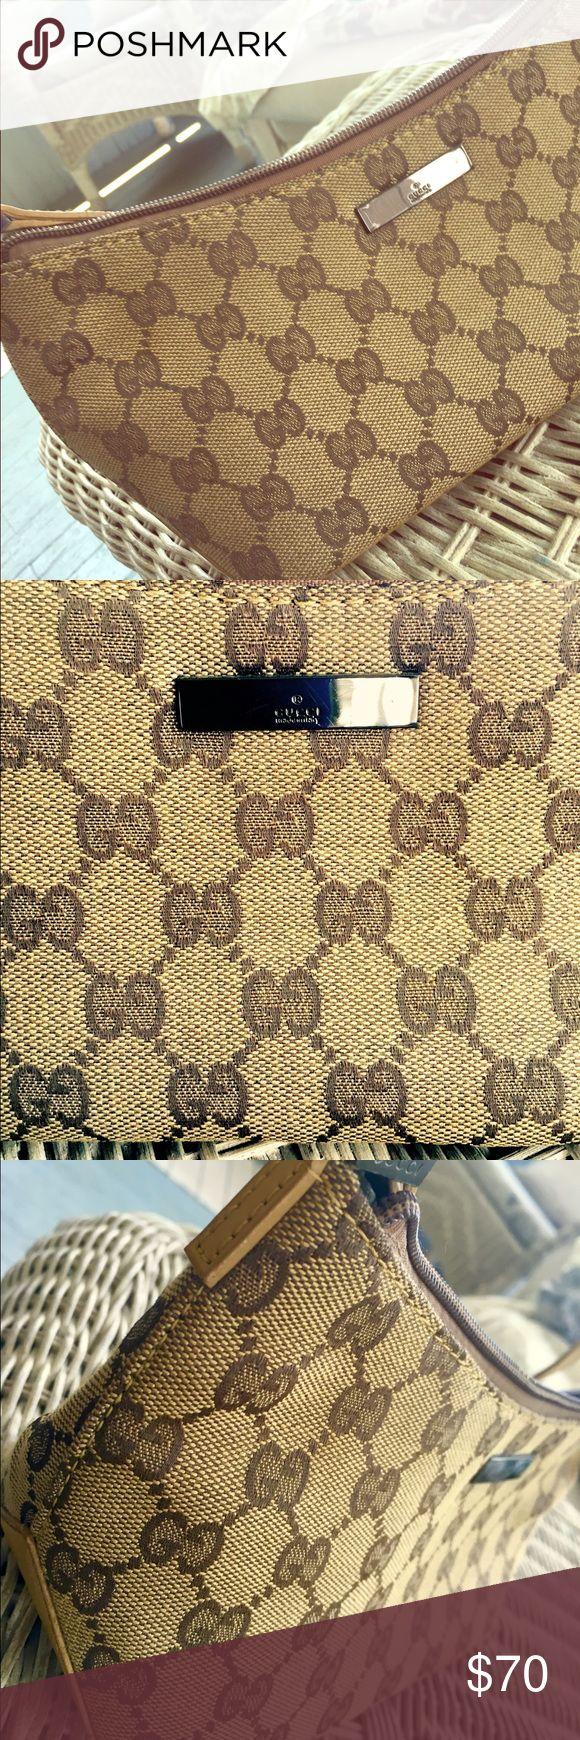 Small designer bag Small authentic Gucci bag PRICE NEGOTIABLE Bags Mini Bags